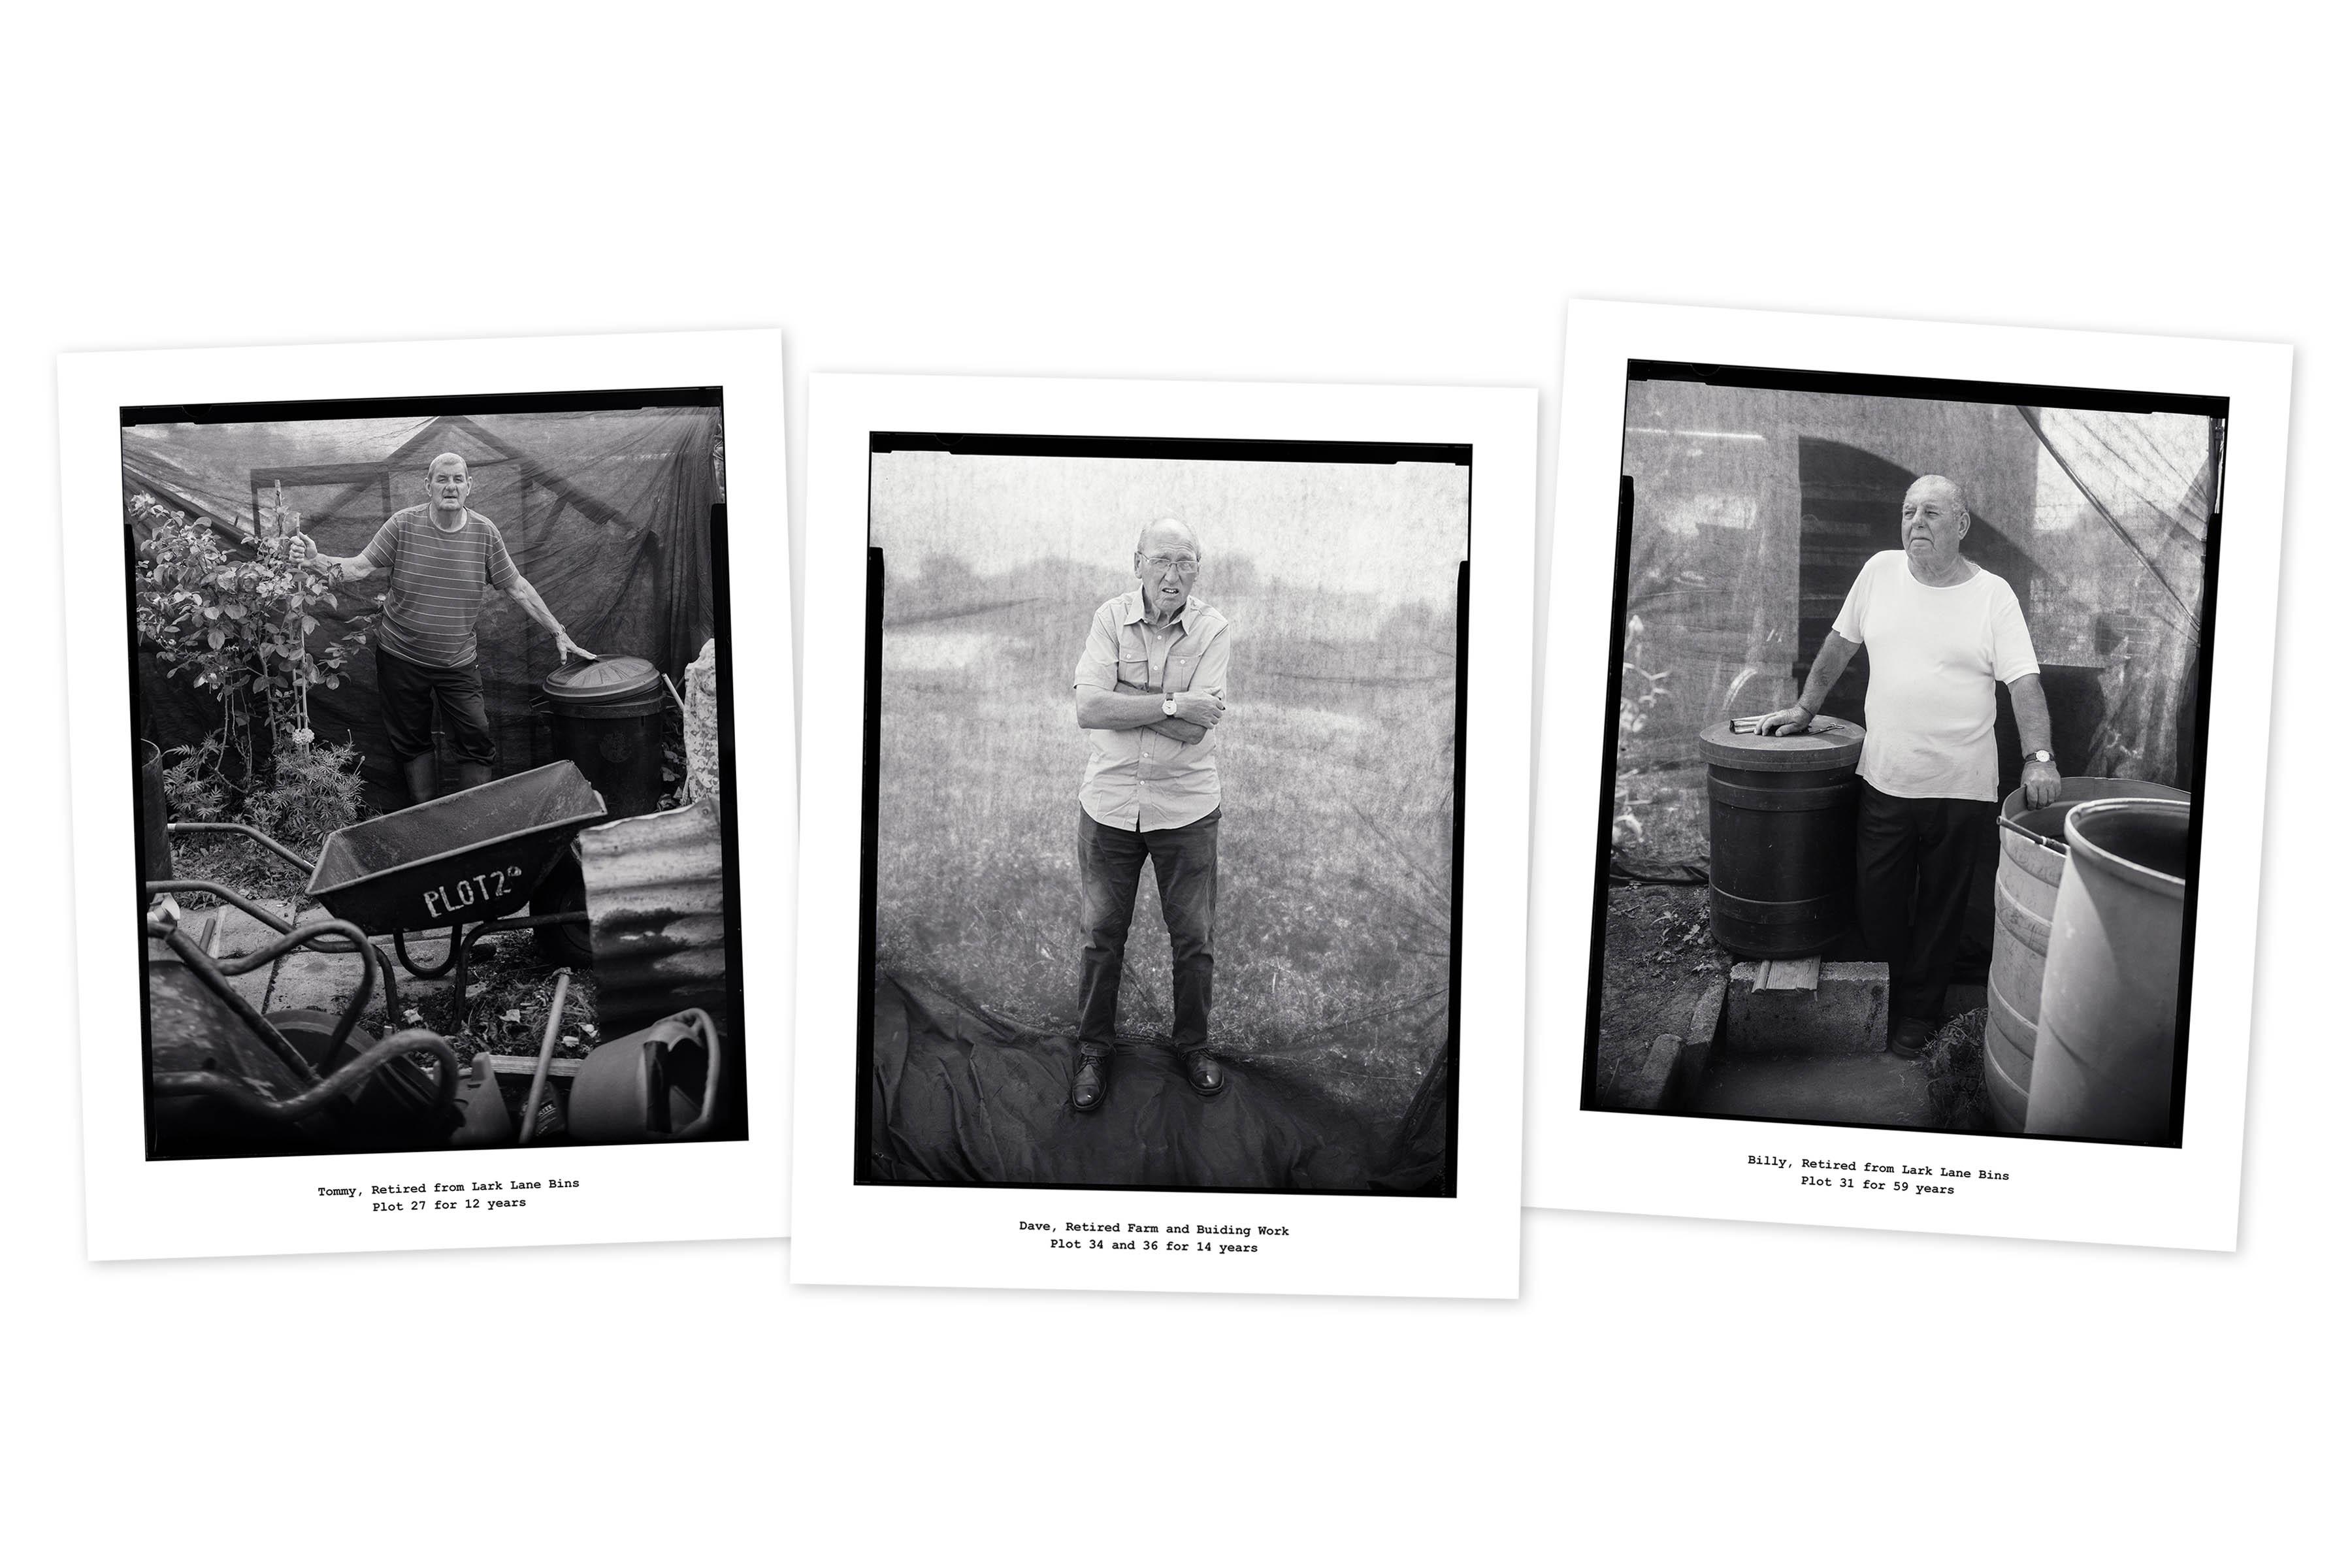 Look Photo Biennial: Victoria Gallery & Museum: Pauline Rowe & Dave Lockwood - The Allotments